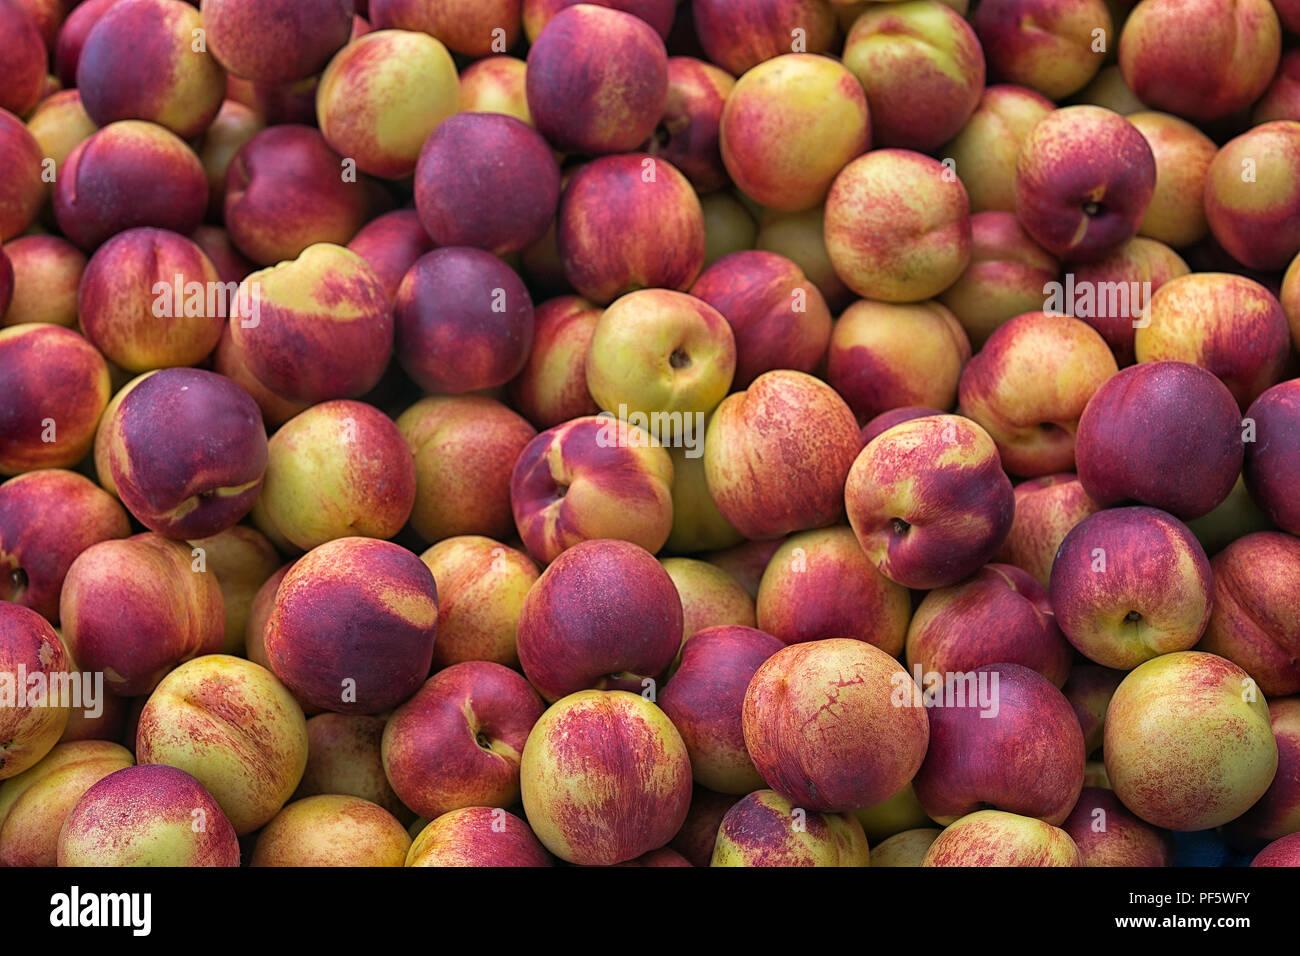 Nettarine (Prunus persica var. nectarina), buccia liscia di pesche, pila nel mercato, beckground Immagini Stock